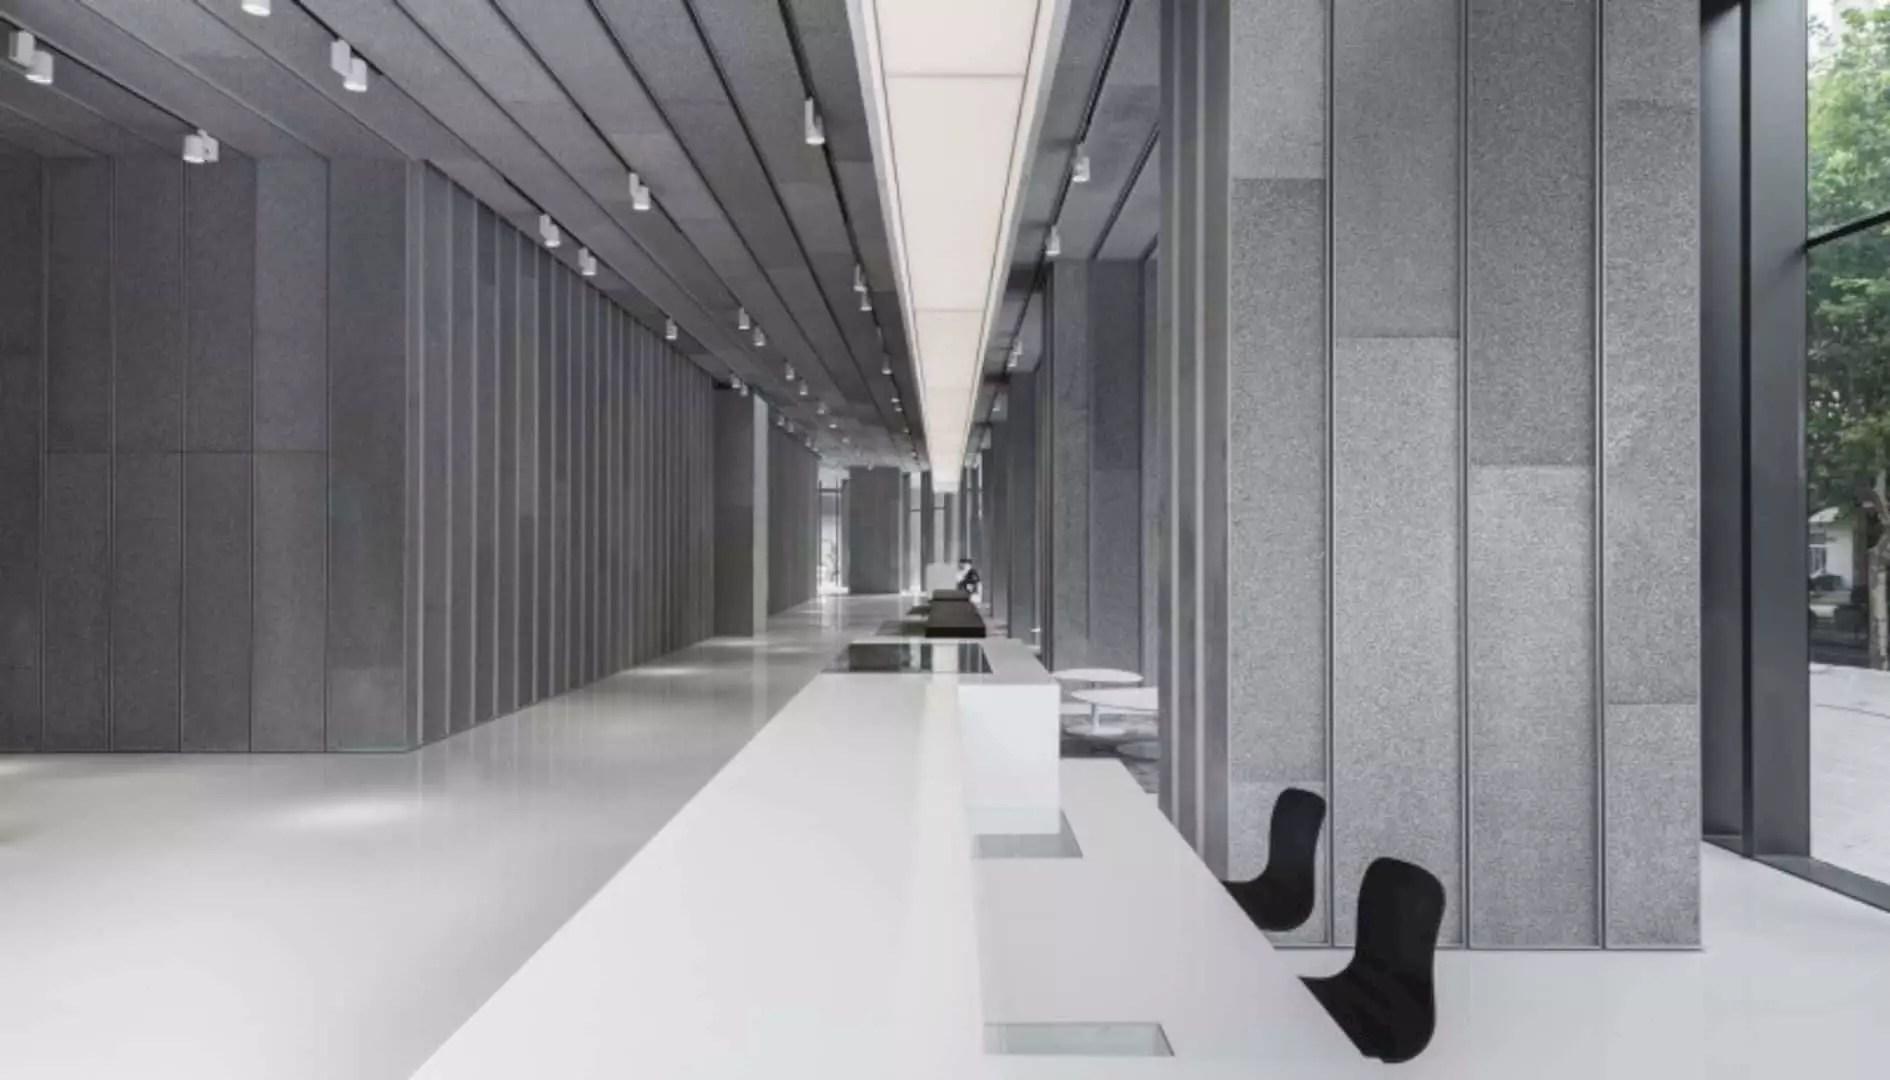 Aluminum Lobby: An Environmental-Friendly Lobby with Futuristic Design